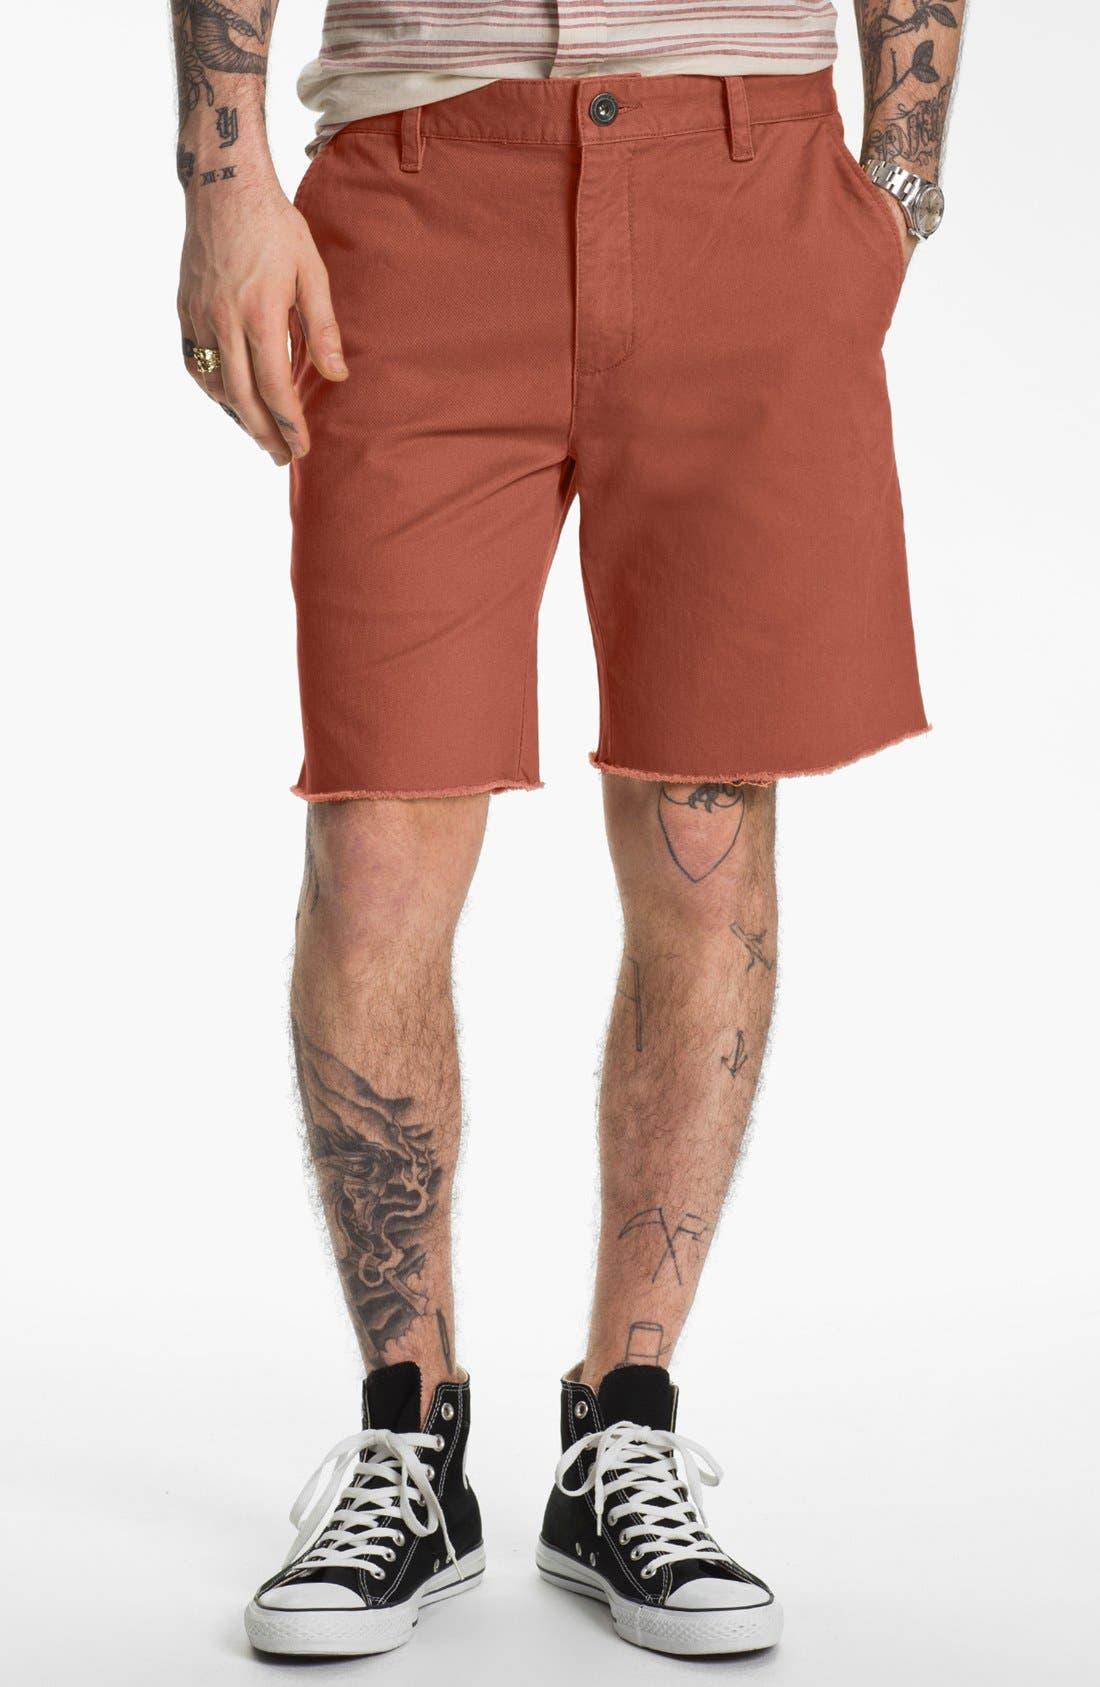 Main Image - RVCA 'All Time' Cut Off Chino Shorts